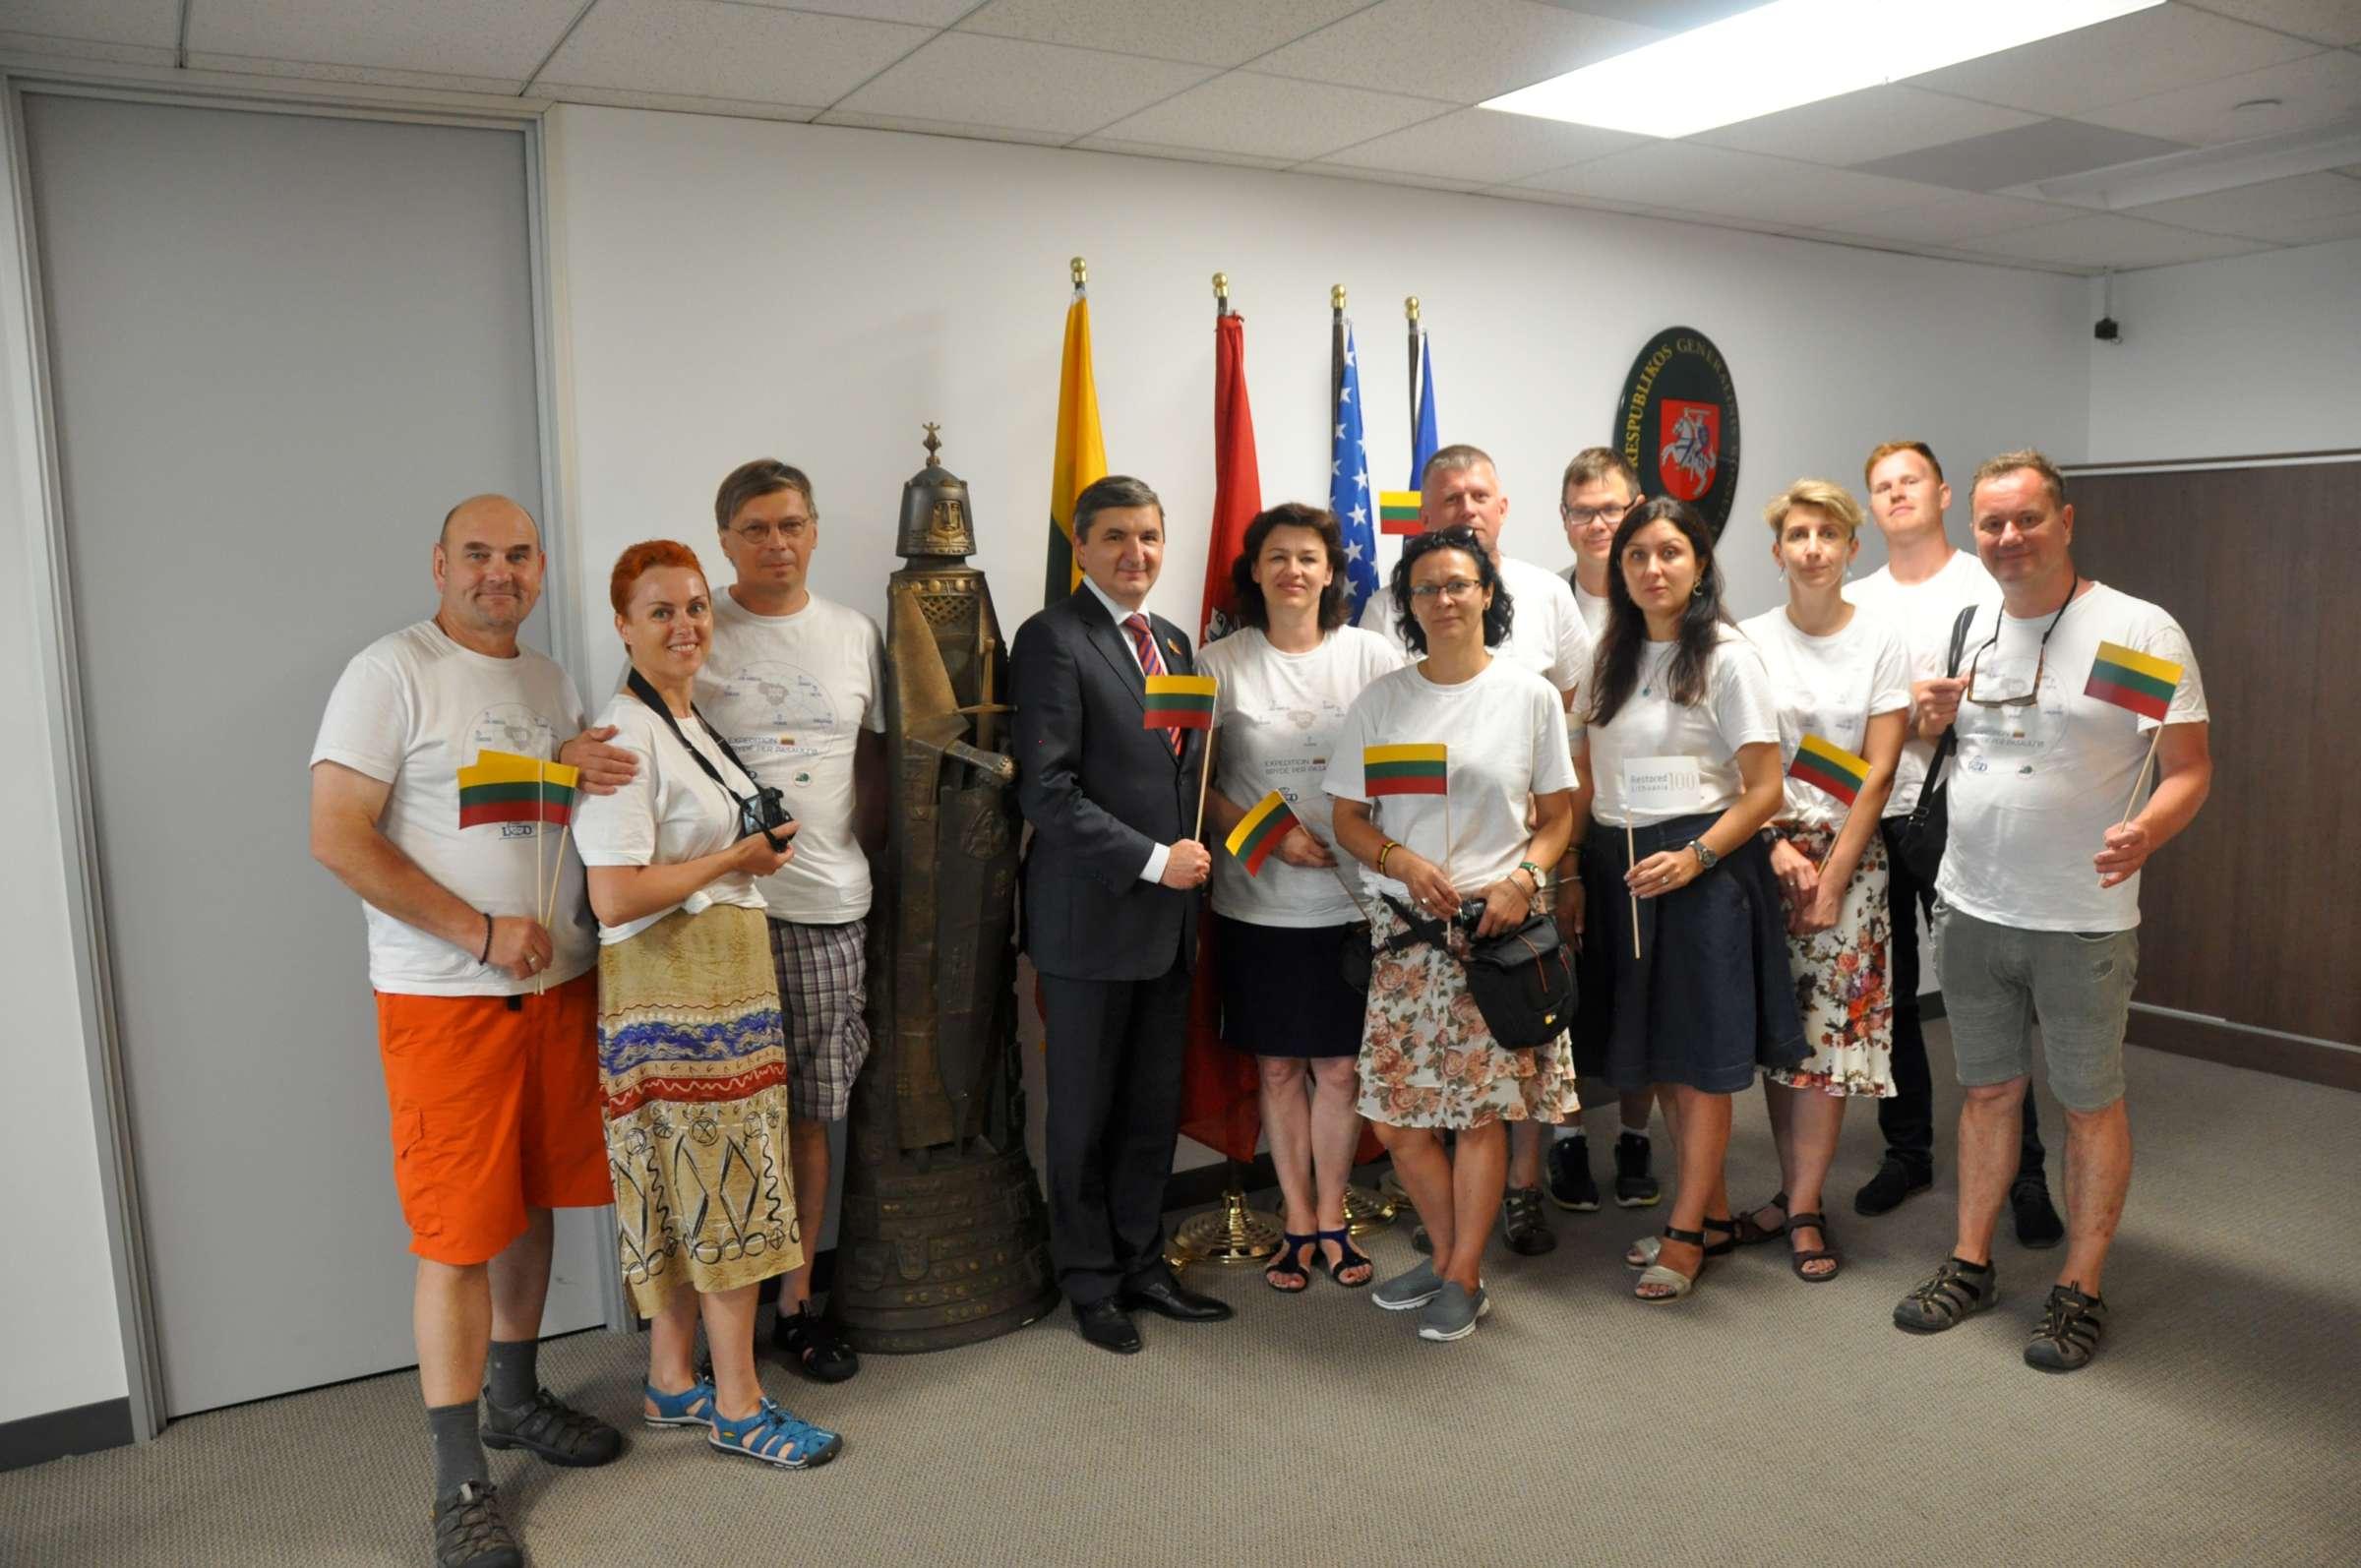 Los Angeles Lietuvos konsulate su Generaliniu konsulu Dariumi Gaidžiu-2400